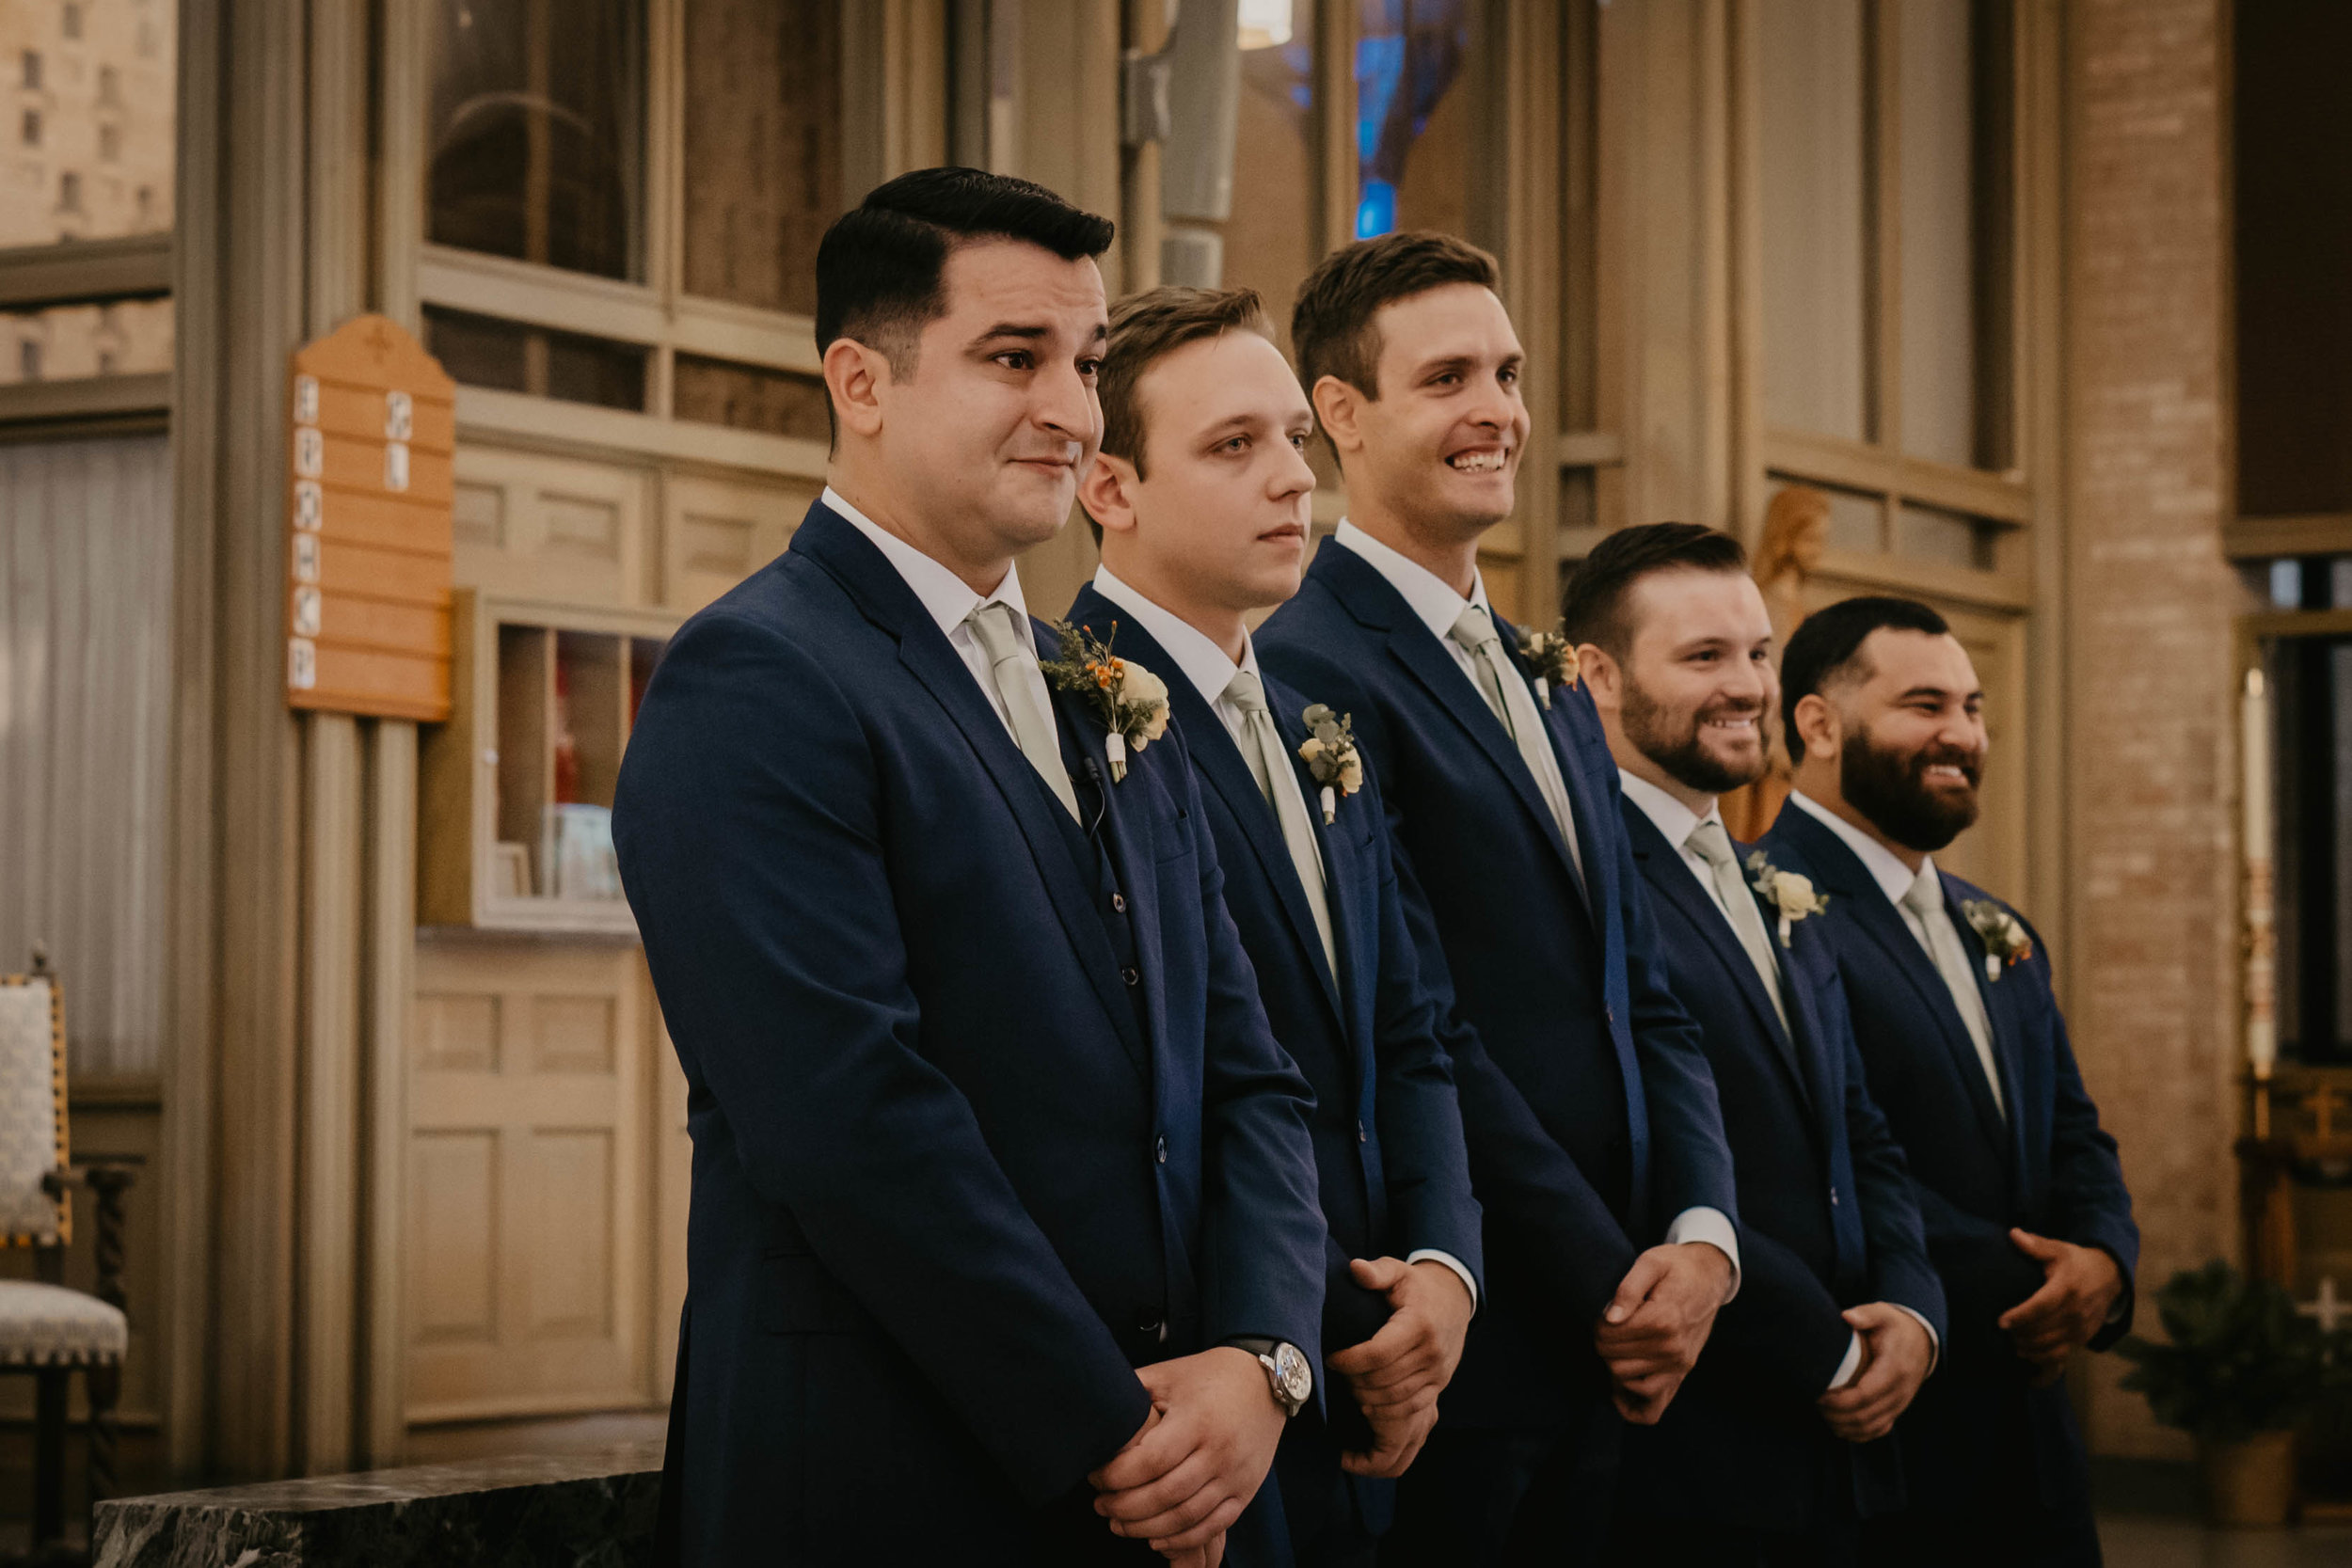 austin-wedding-videographer (22 of 999).jpg